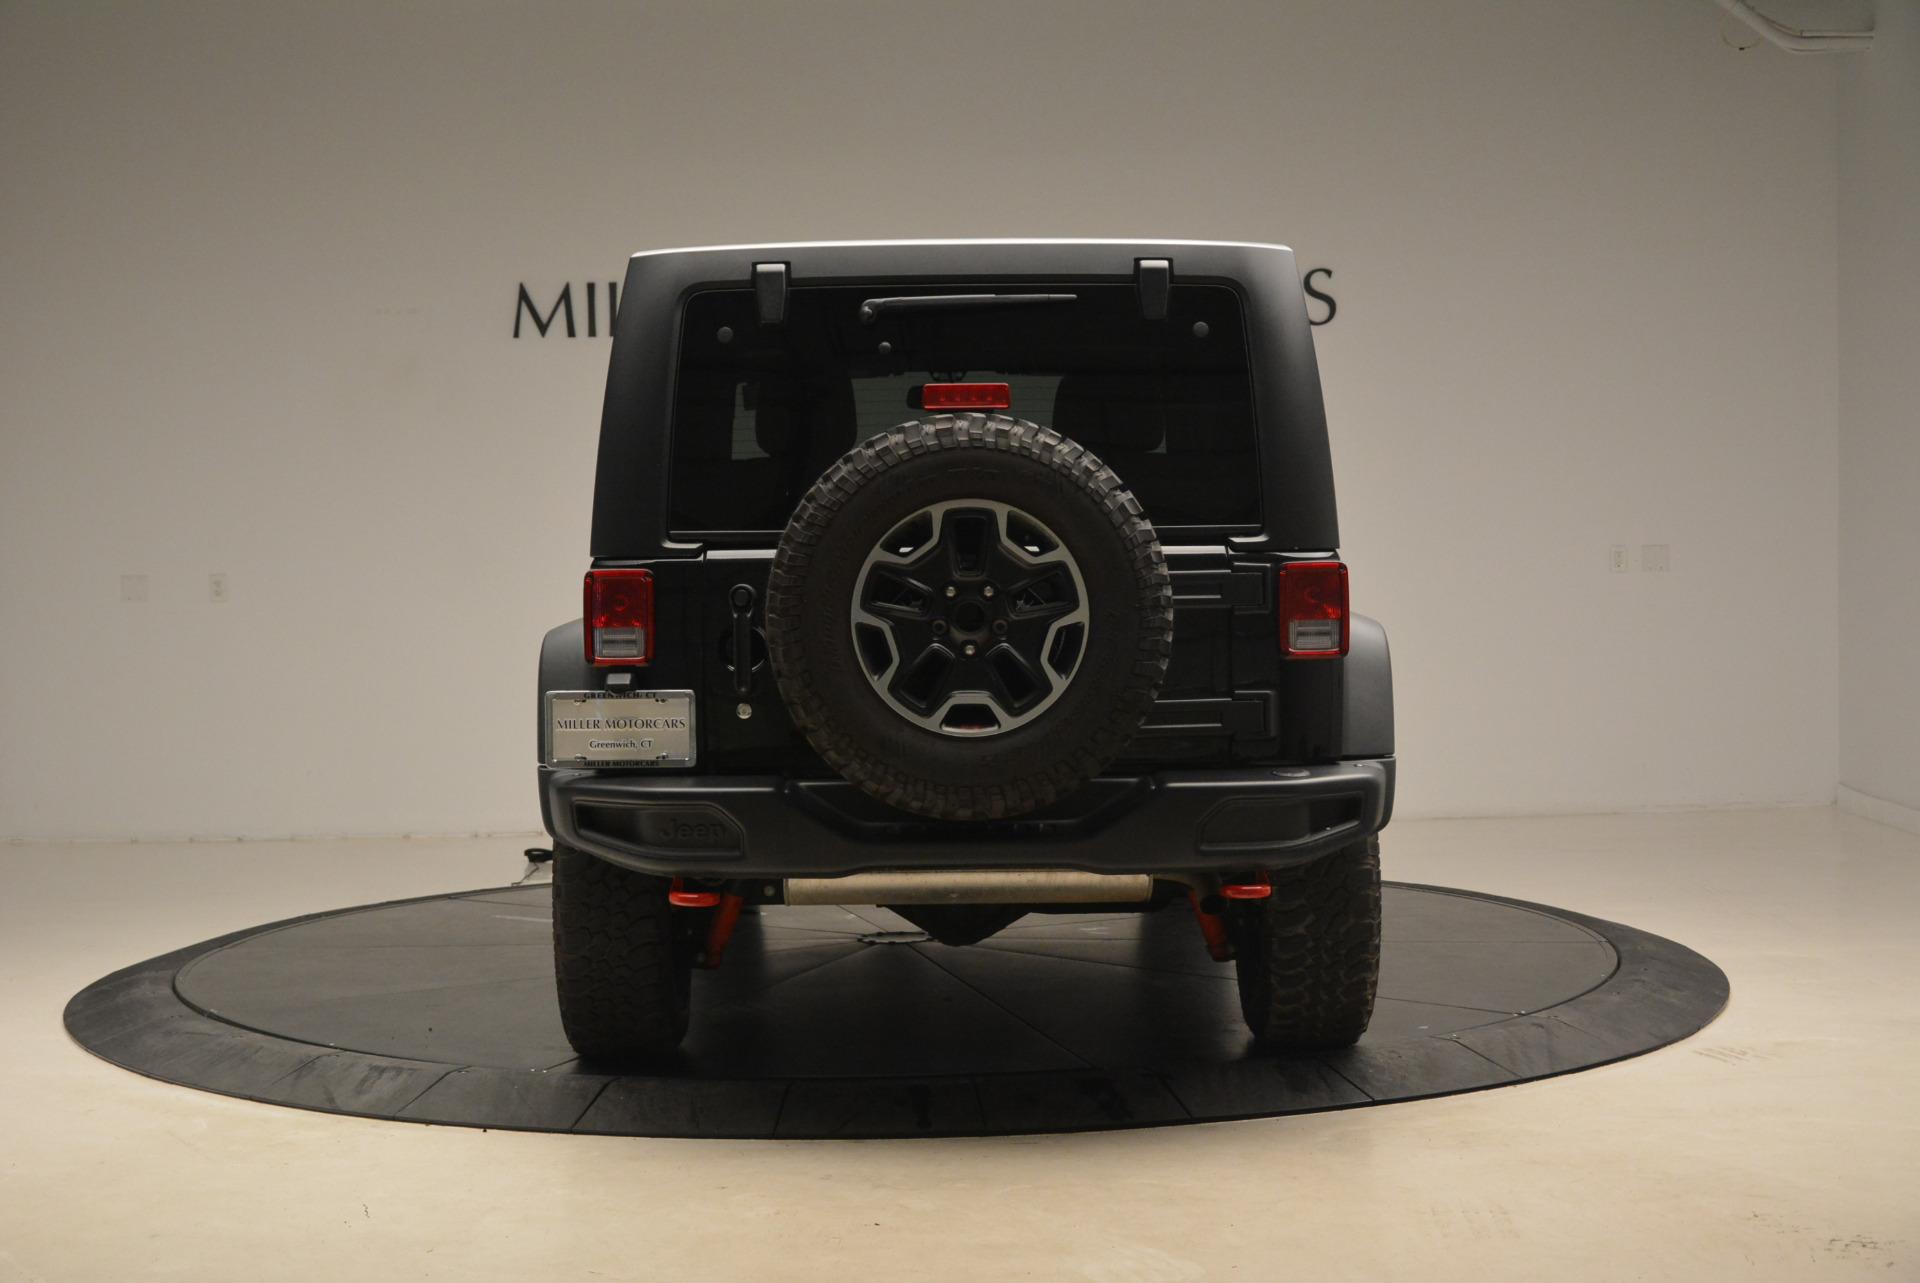 Used 2016 Jeep Wrangler Unlimited Rubicon For Sale In Greenwich, CT. Alfa Romeo of Greenwich, 7345A 2218_p6